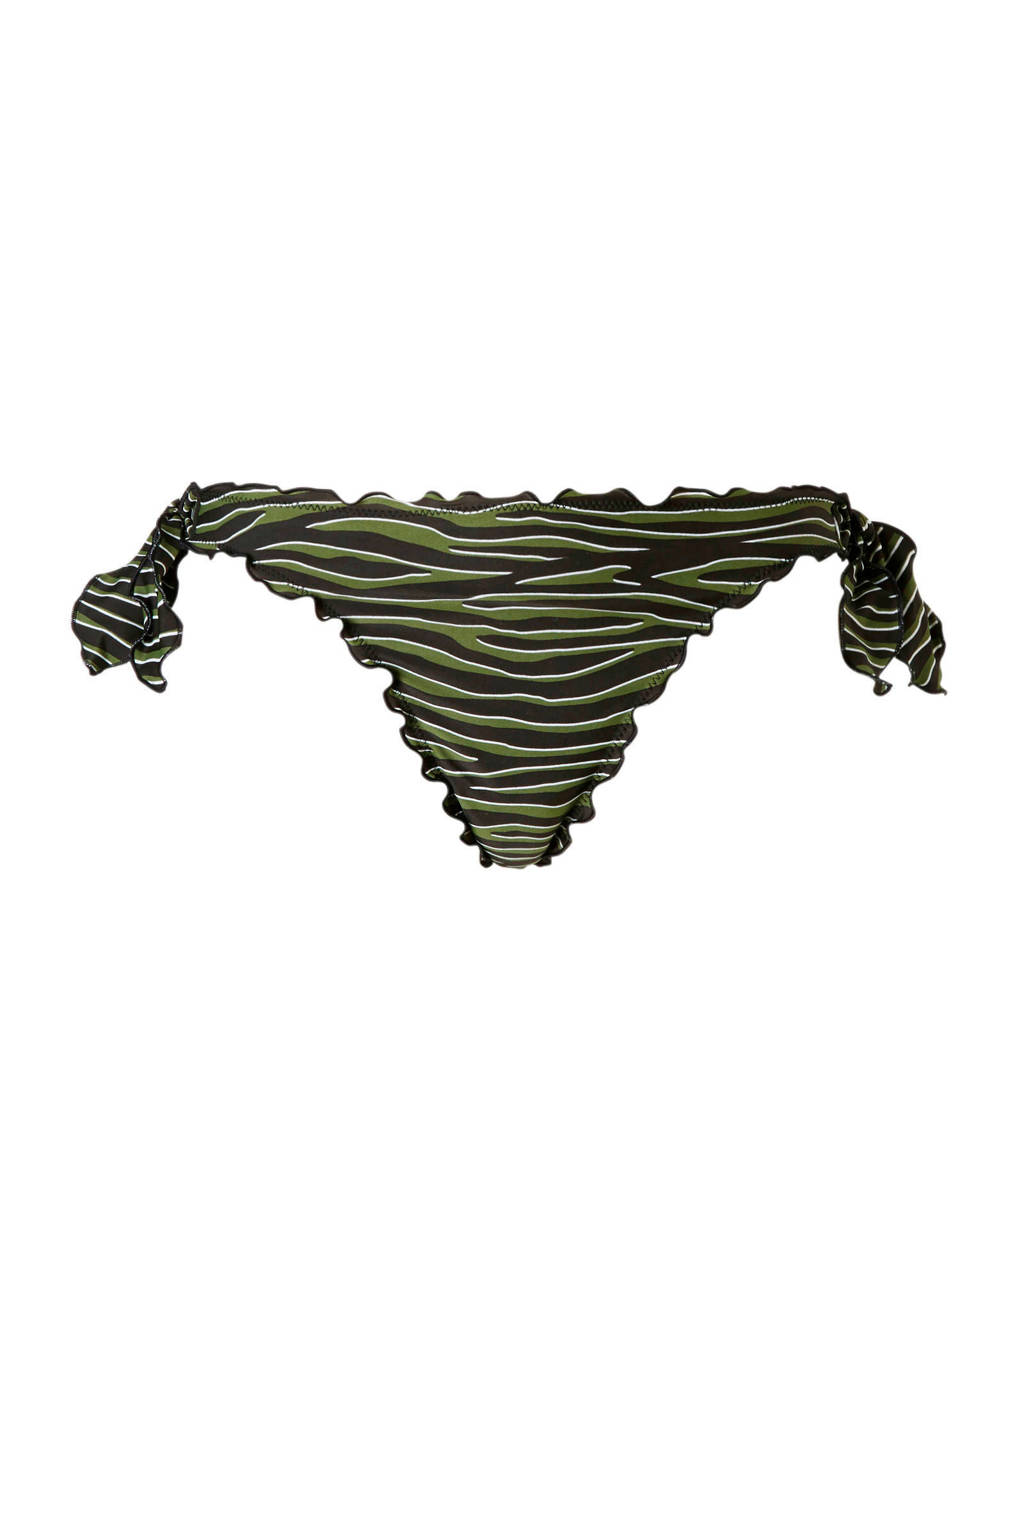 whkmp's beachwave strik bikinibroekje met strepen groen, Groen/zwart